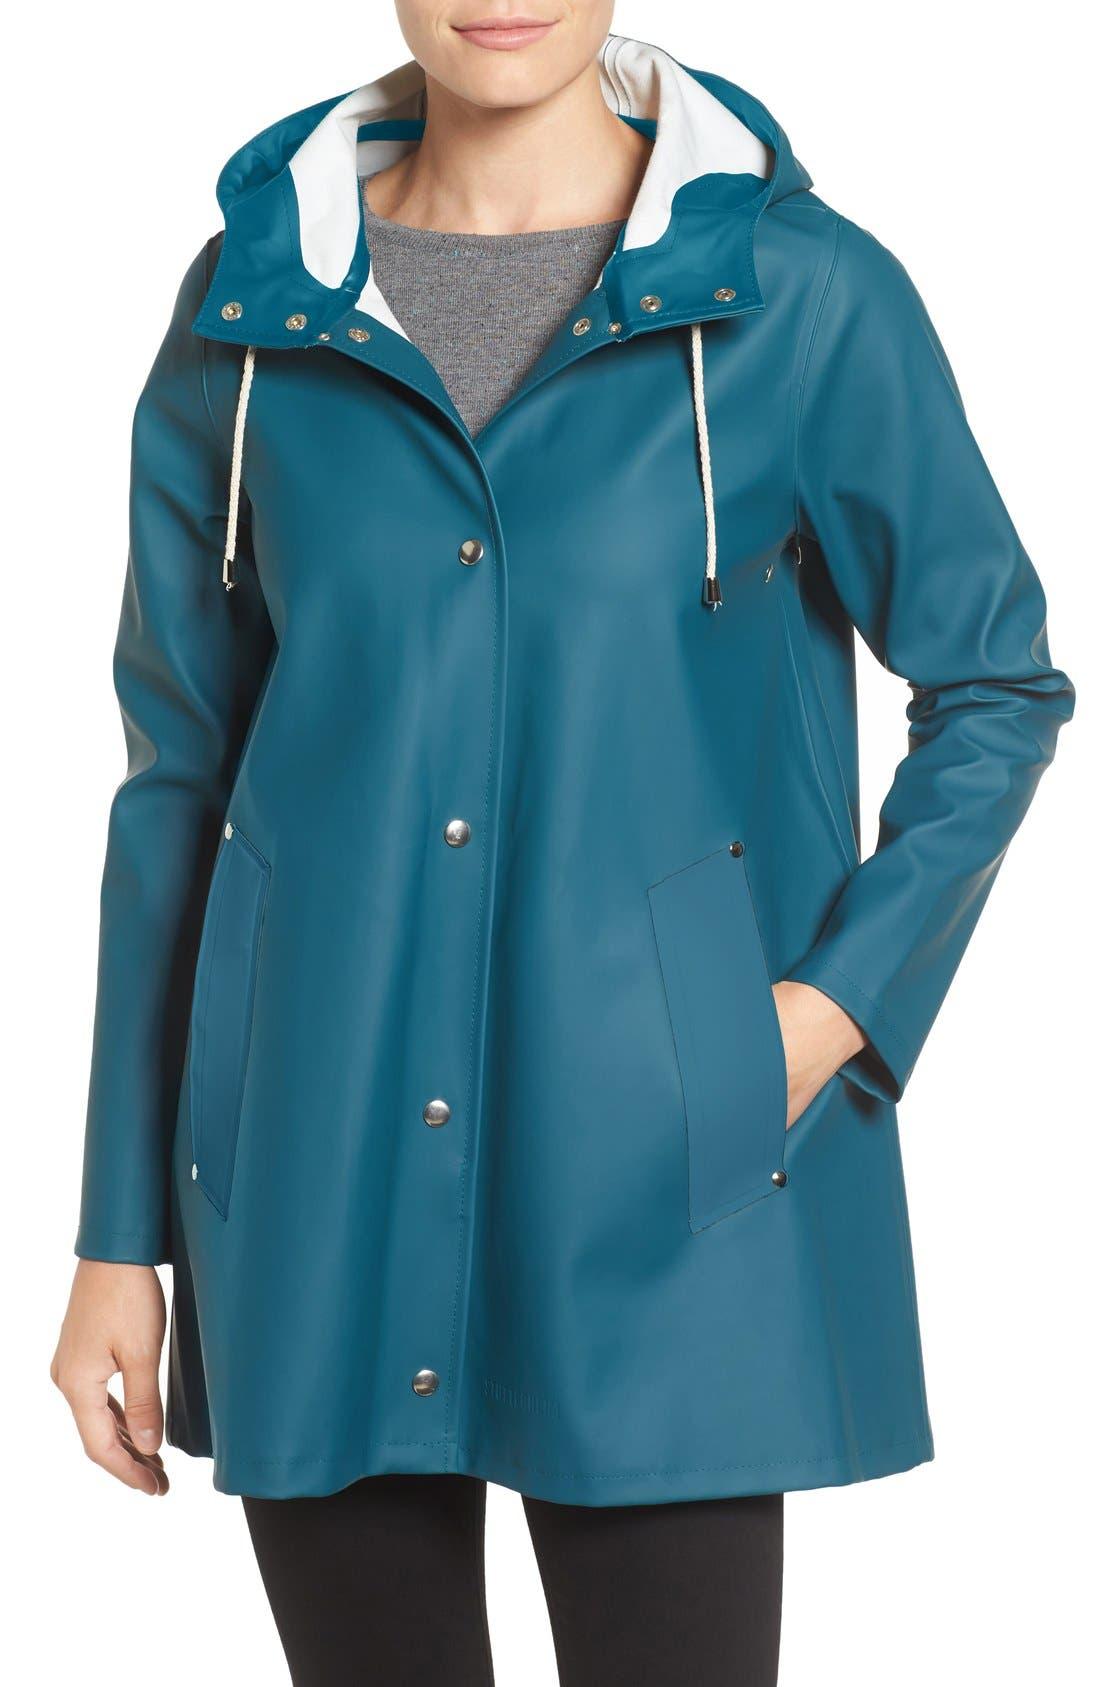 Alternate Image 1 Selected - Stutterheim Mosebacke Waterproof A-Line Raincoat